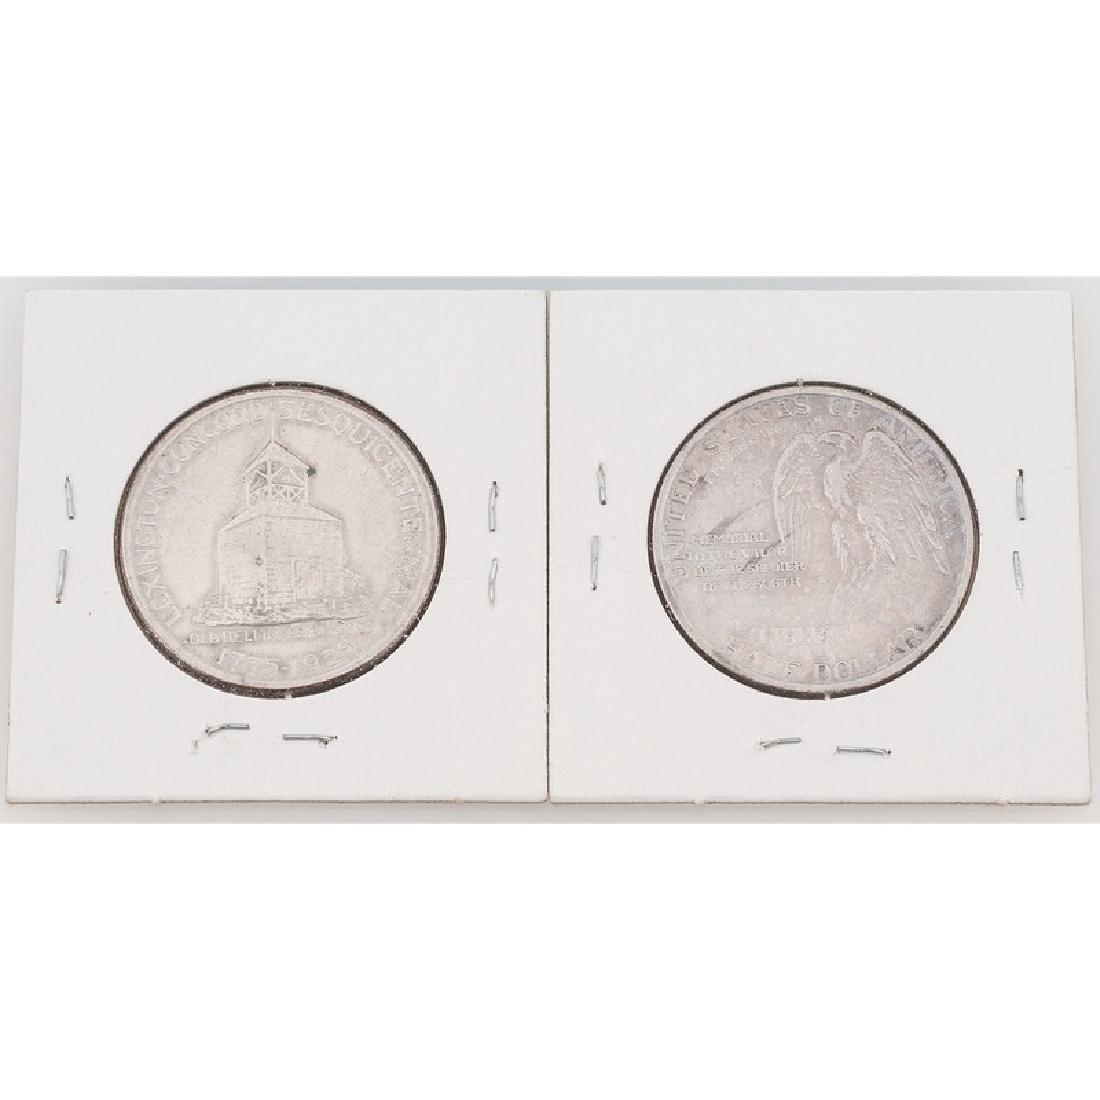 United States Commemorative Half Dollars - 2